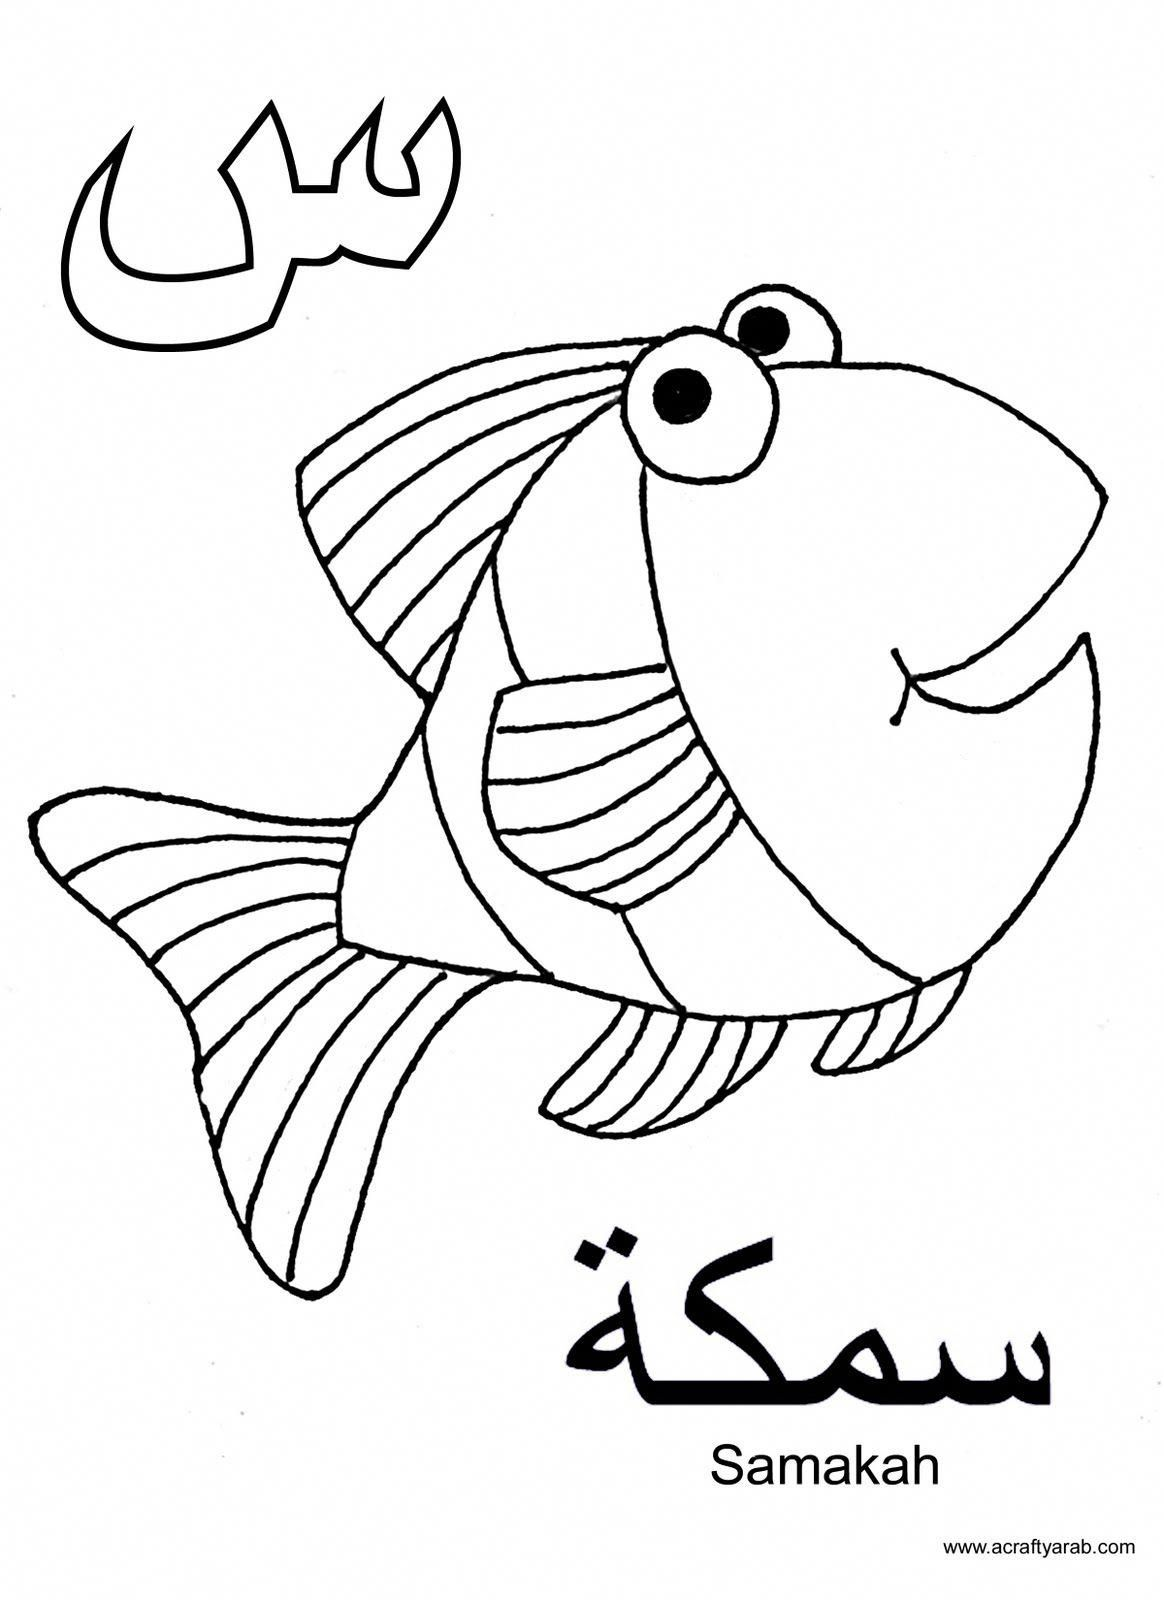 سمكة نيمو للتلوين